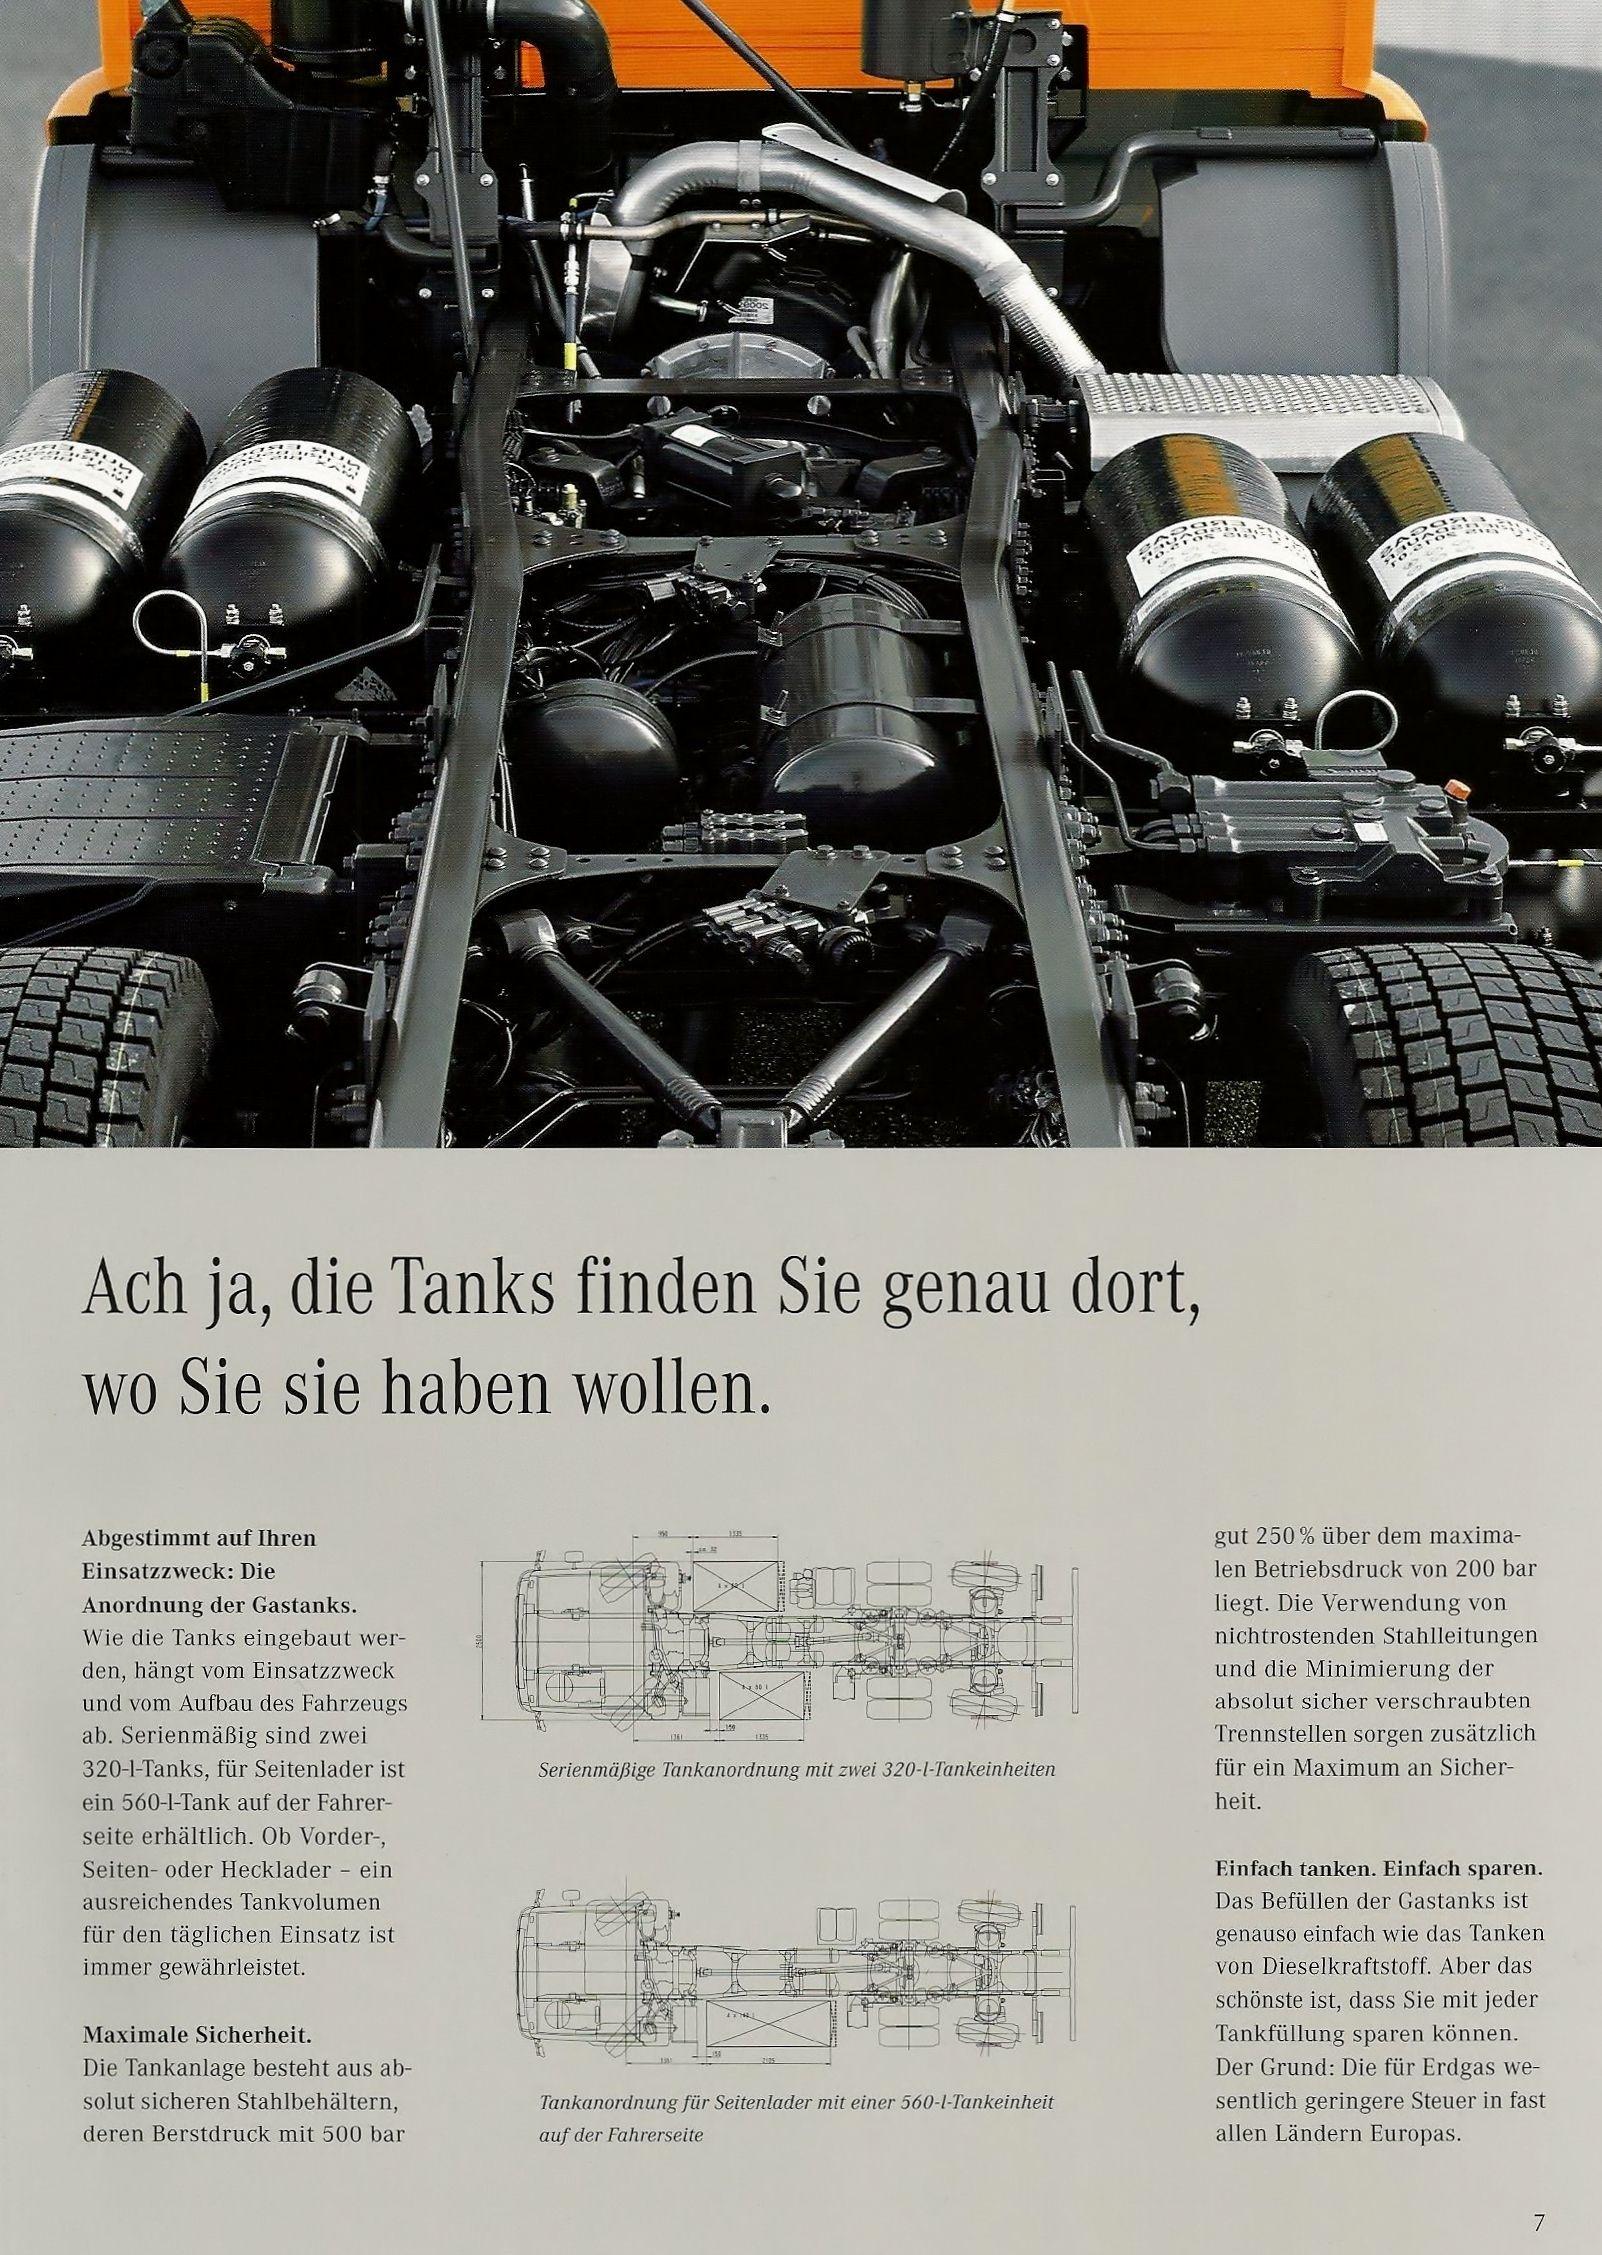 avto zavod mersedes benz germany